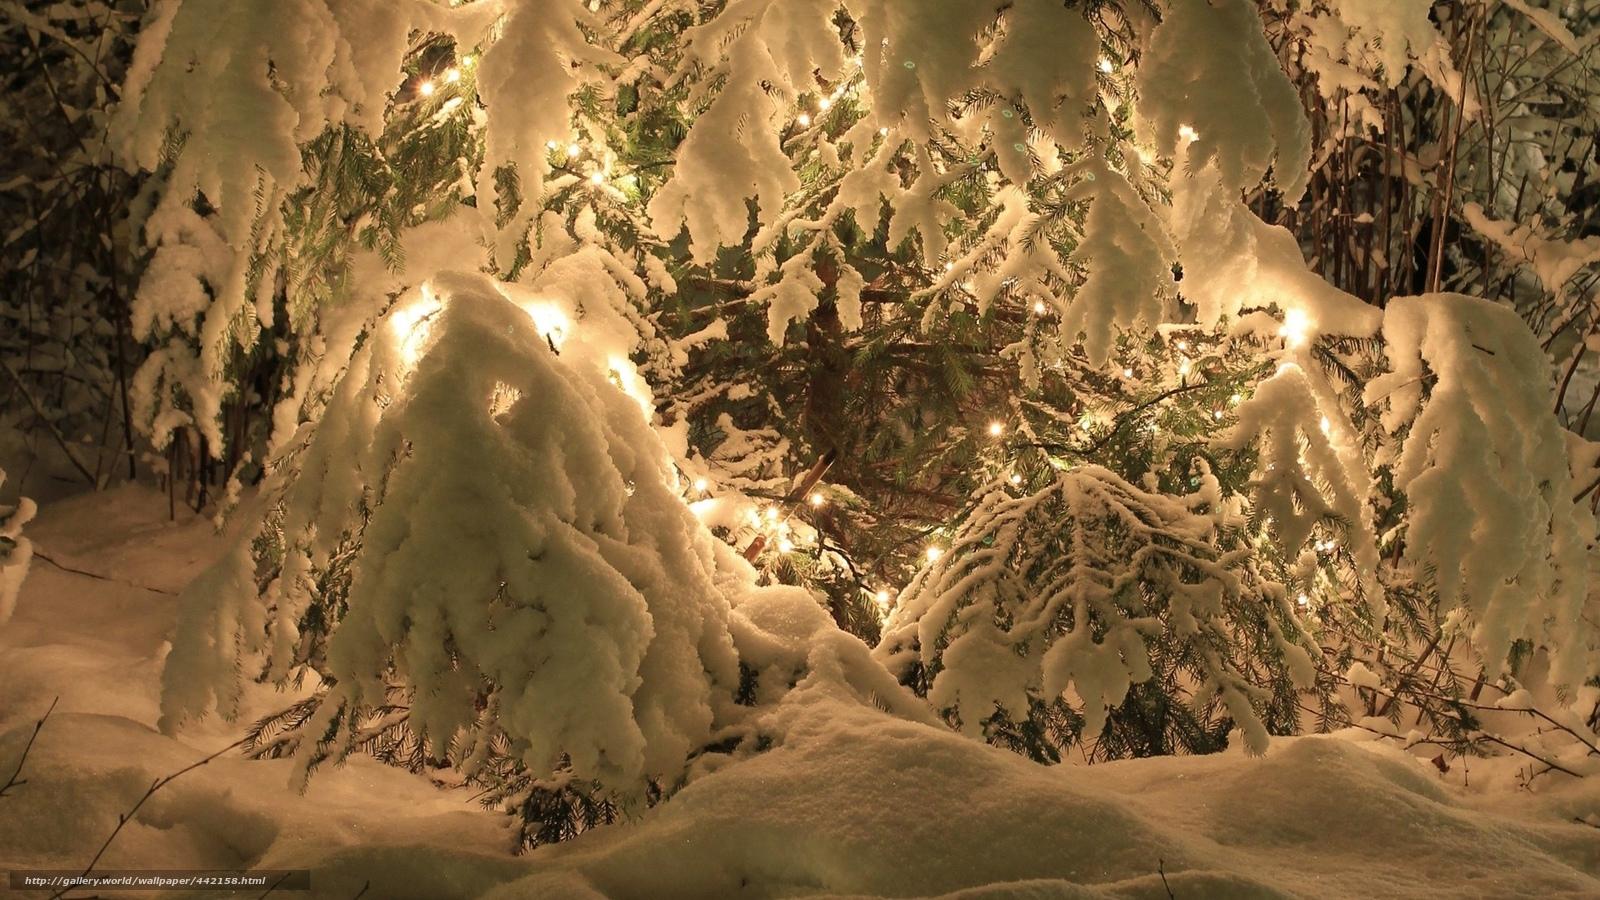 1600x900 hd desktop wallpaper winter - photo #28